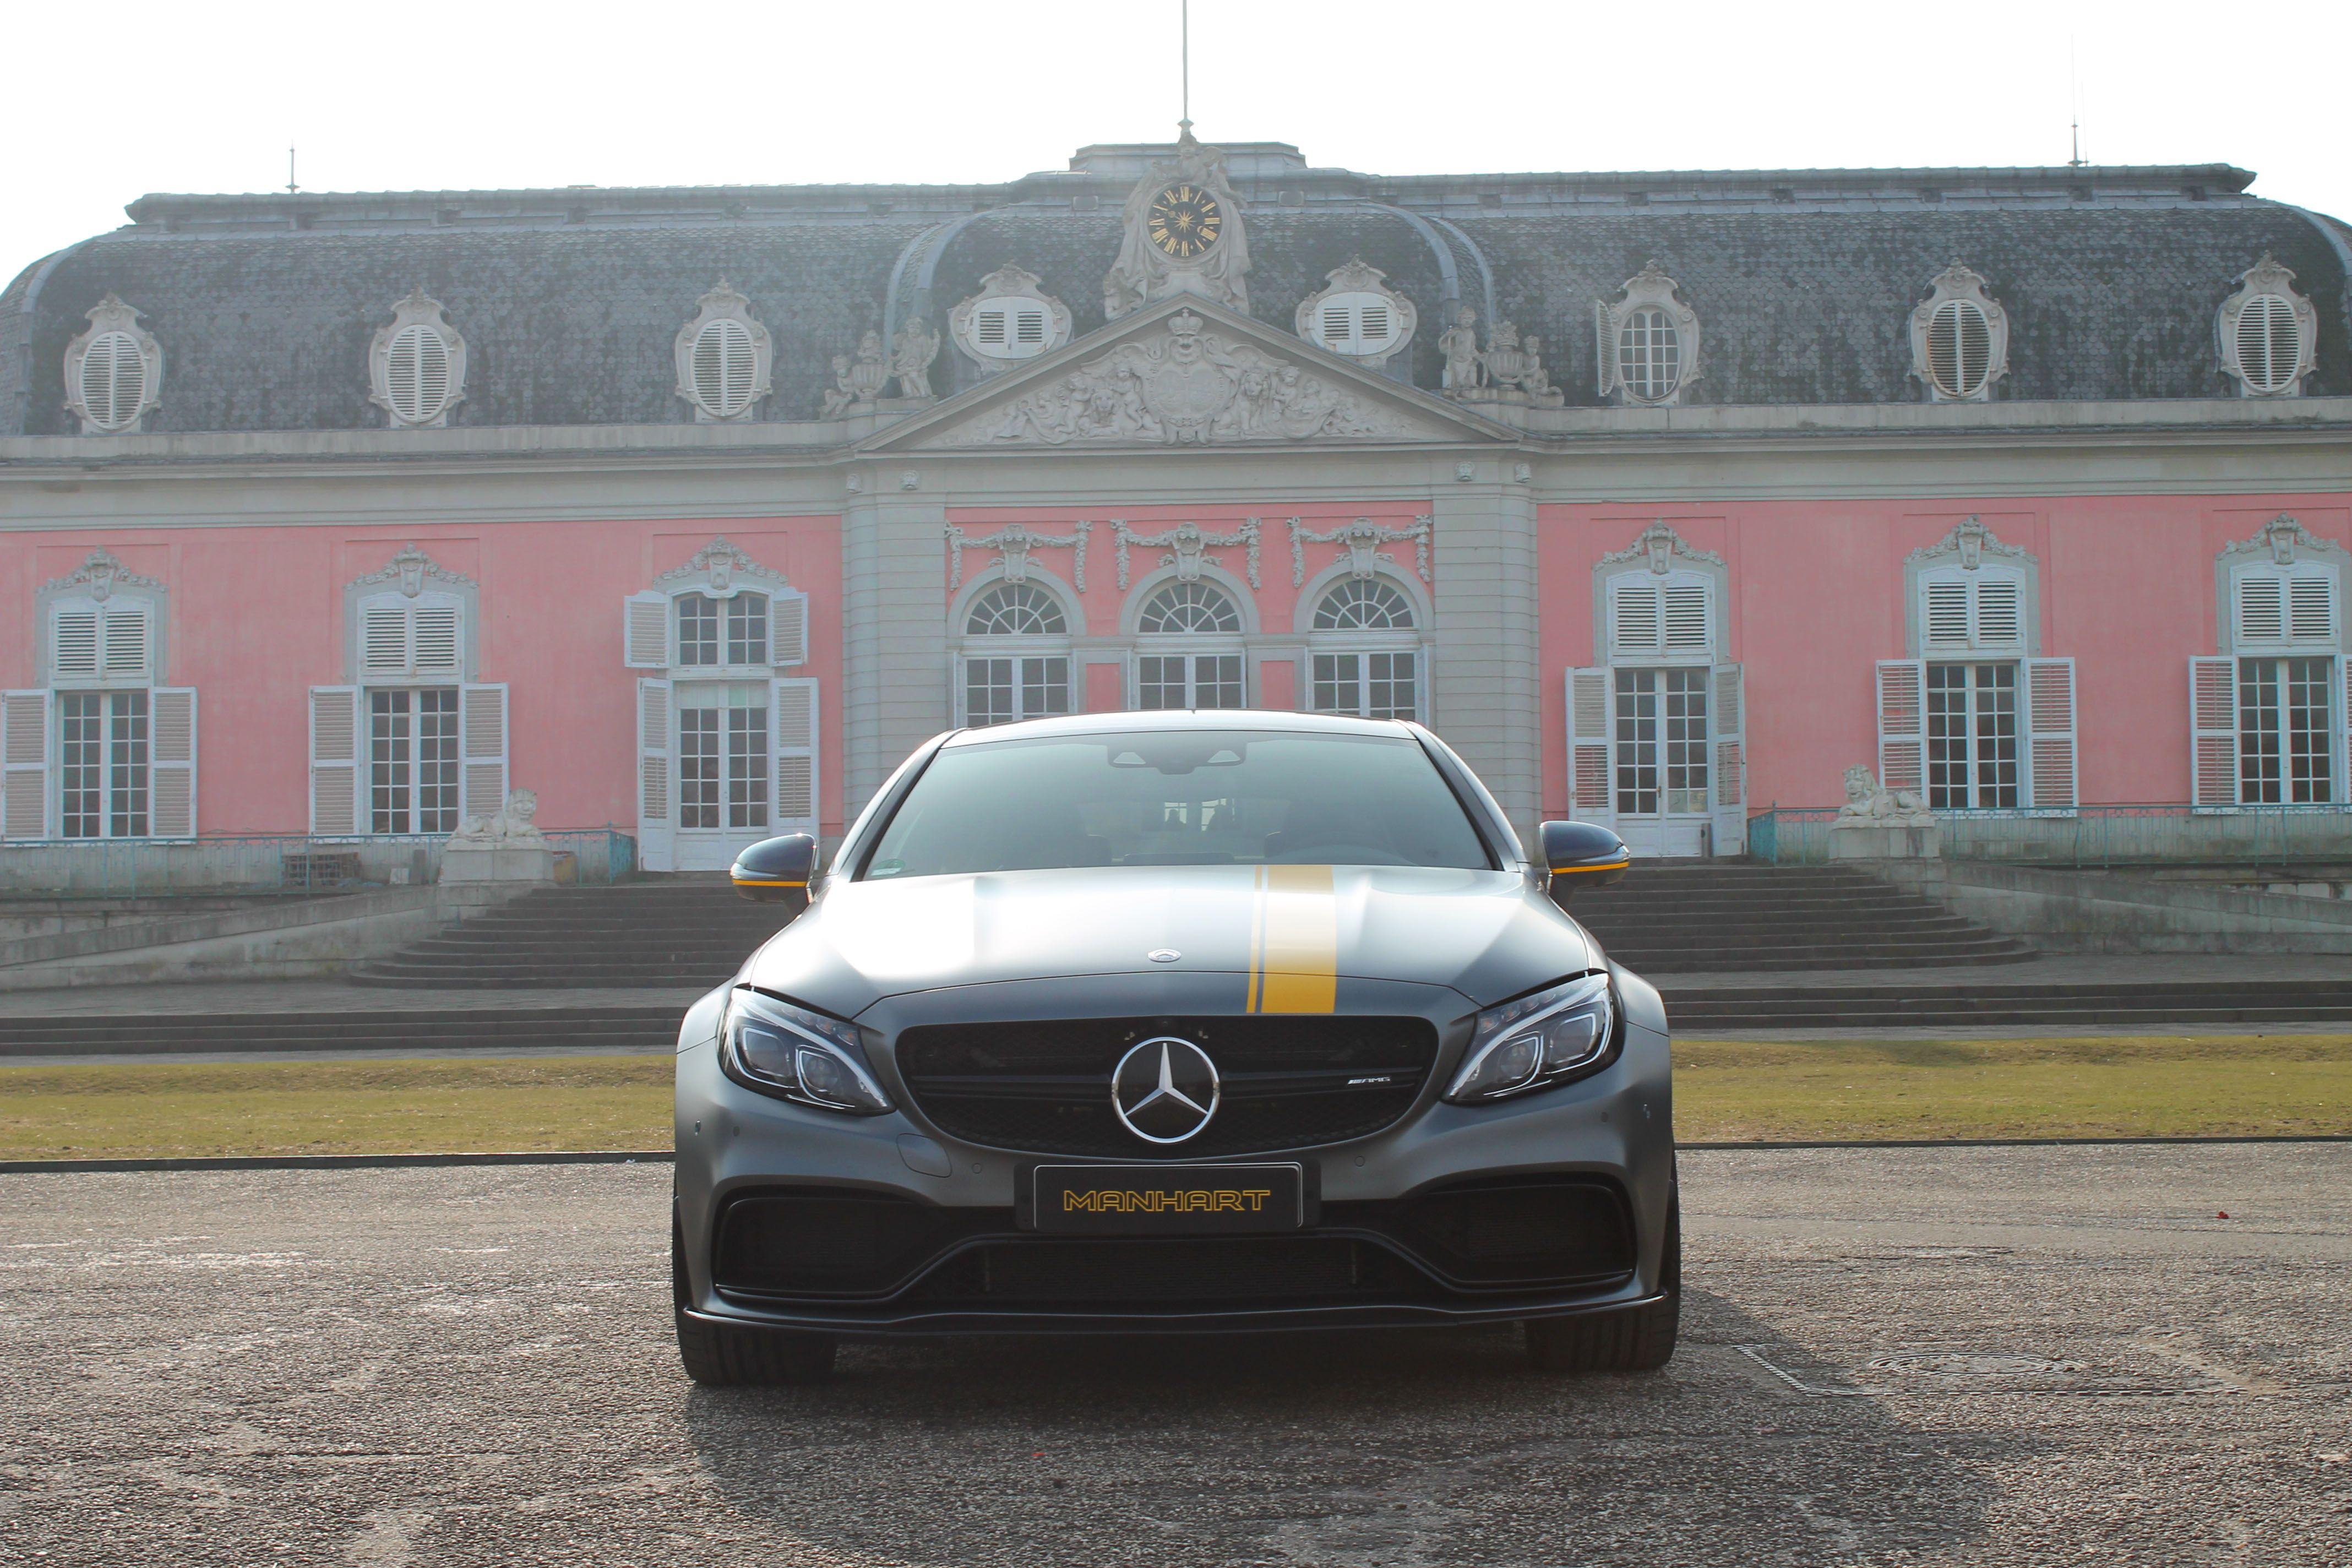 Pin by MANHART Performance on Manhart CR700 Based om Mercedes Benz C